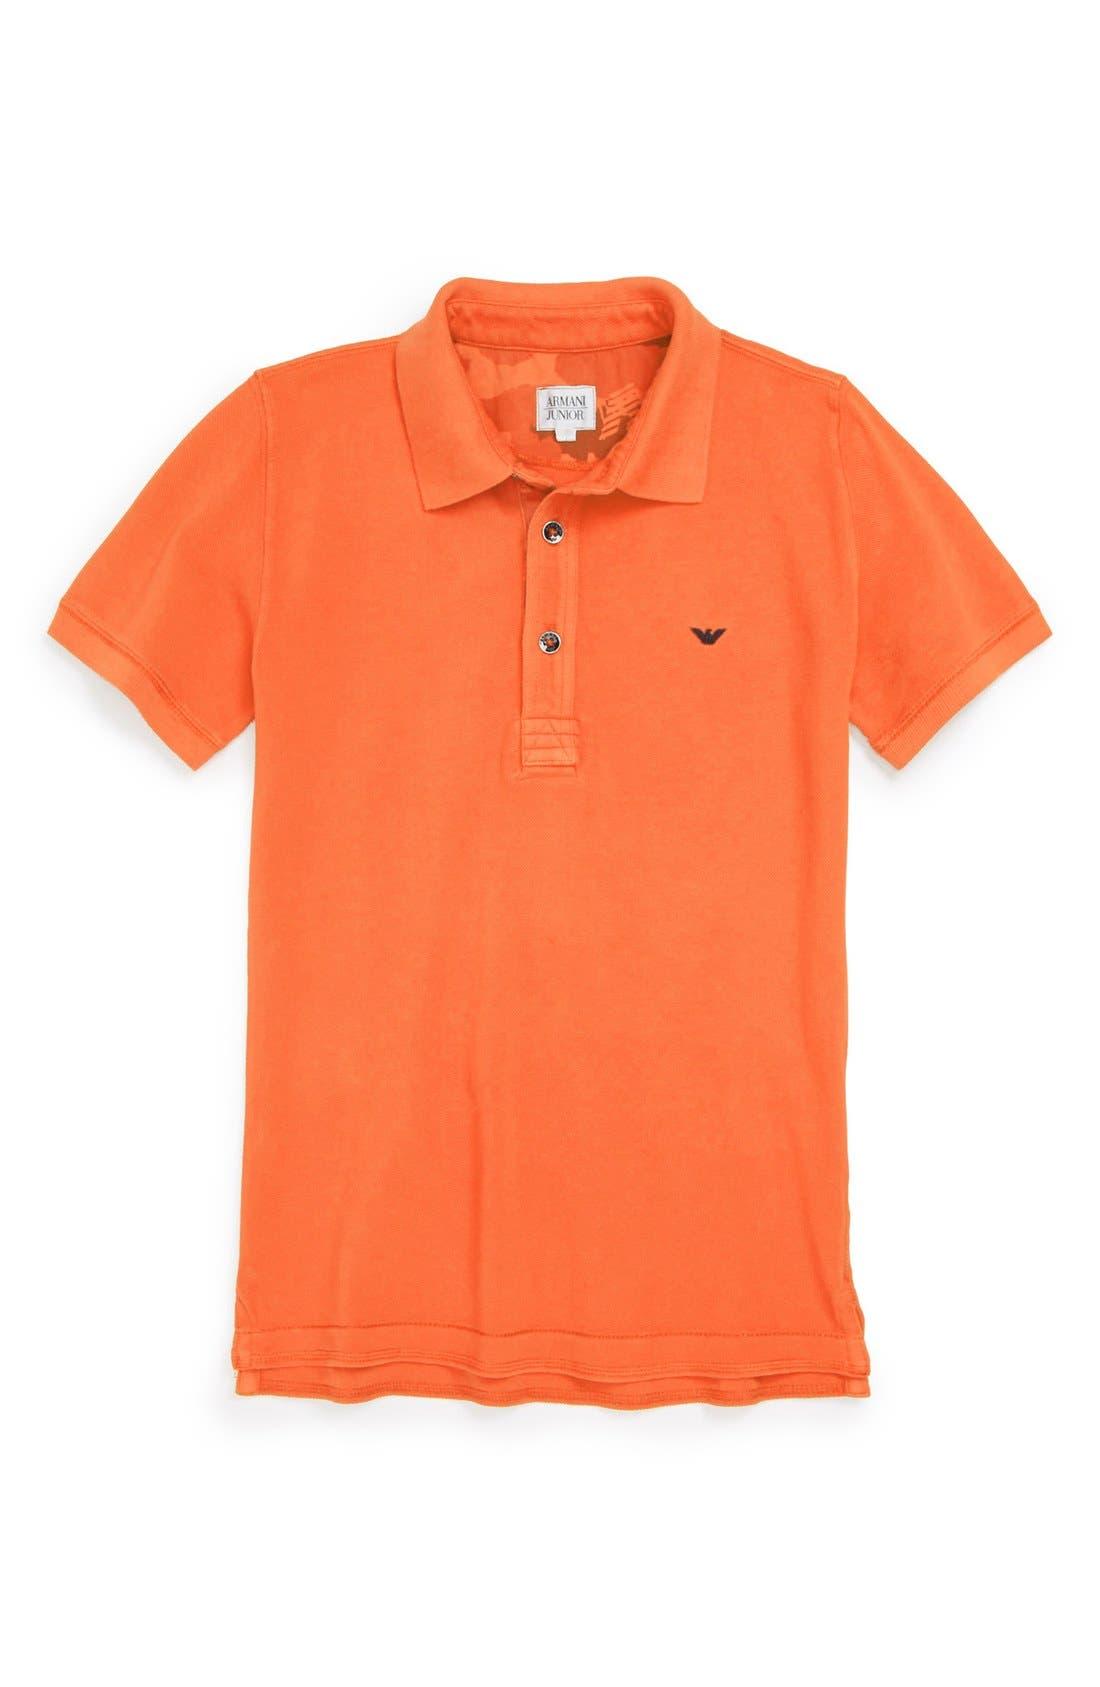 Alternate Image 1 Selected - Armani Junior Polo Shirt (Toddler Boys, Little Boys & Big Boys)